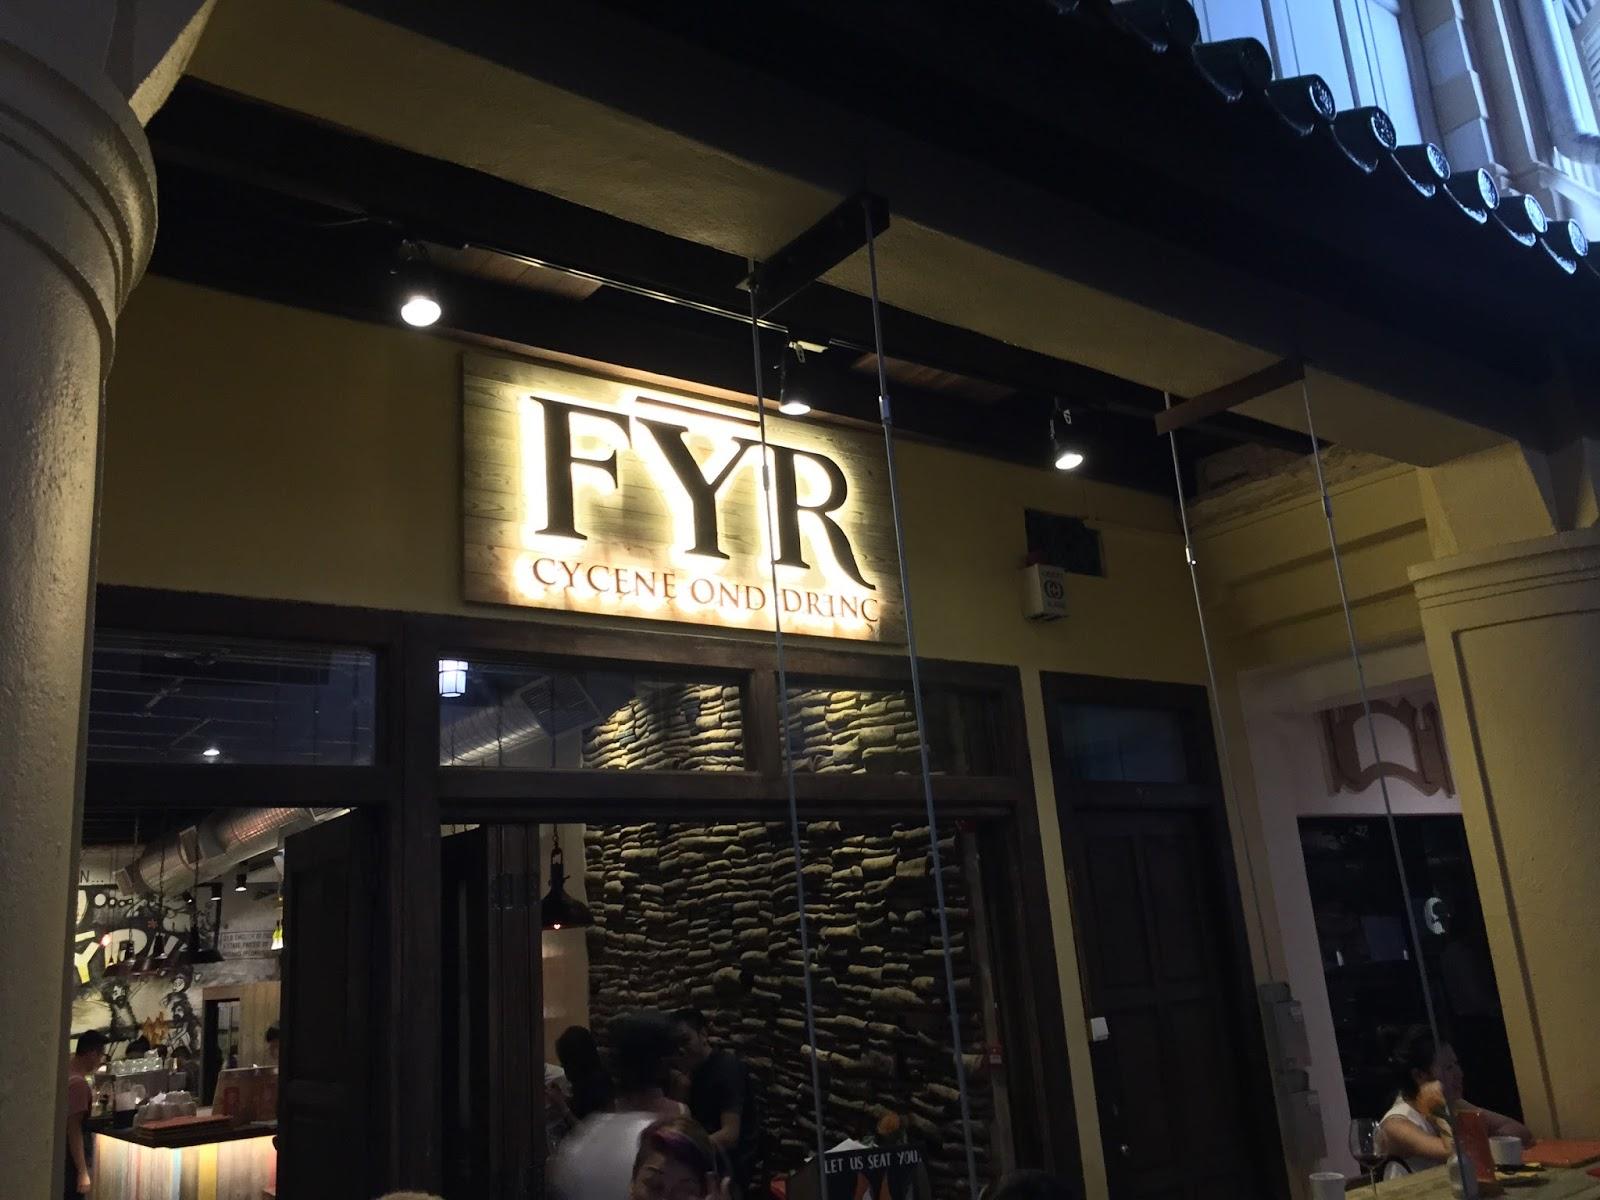 FYR Cycene Ond Drinc (Boon Tat Street)